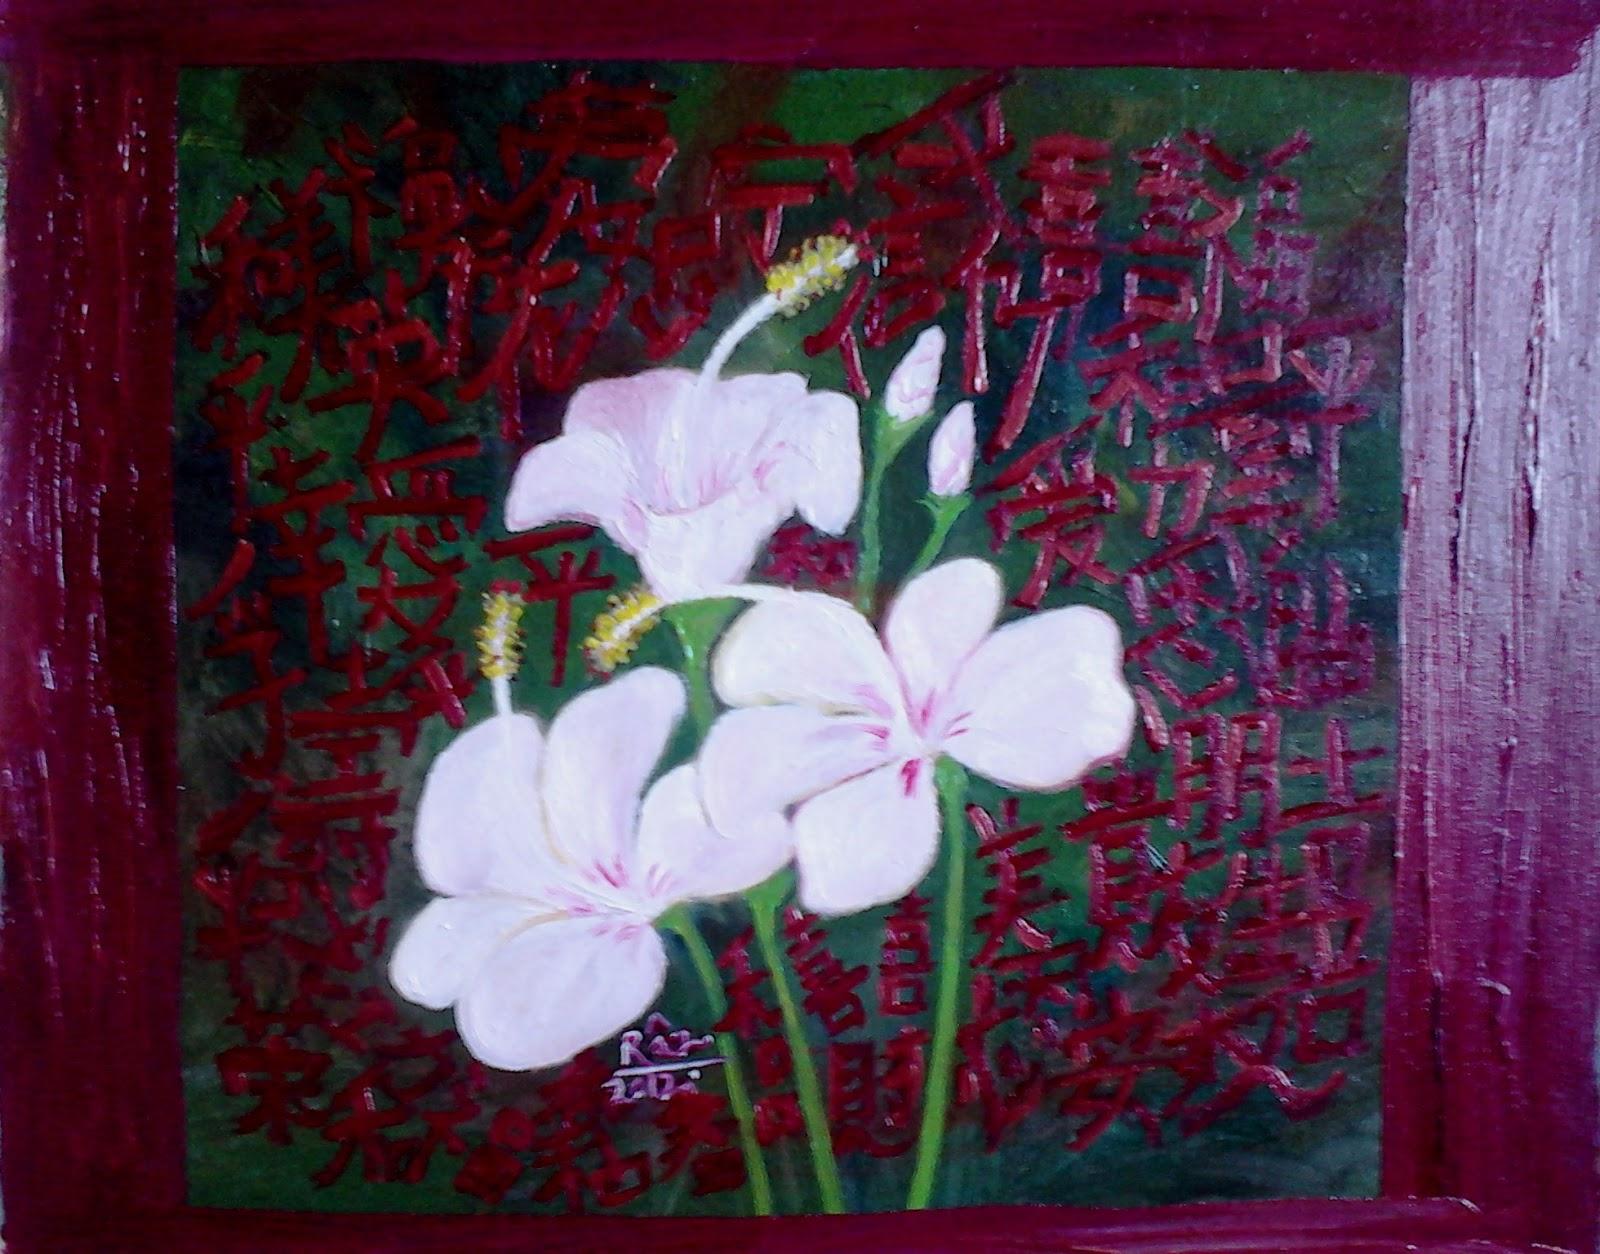 Razarts Symbols In Nature The White Hibiscus Flowers